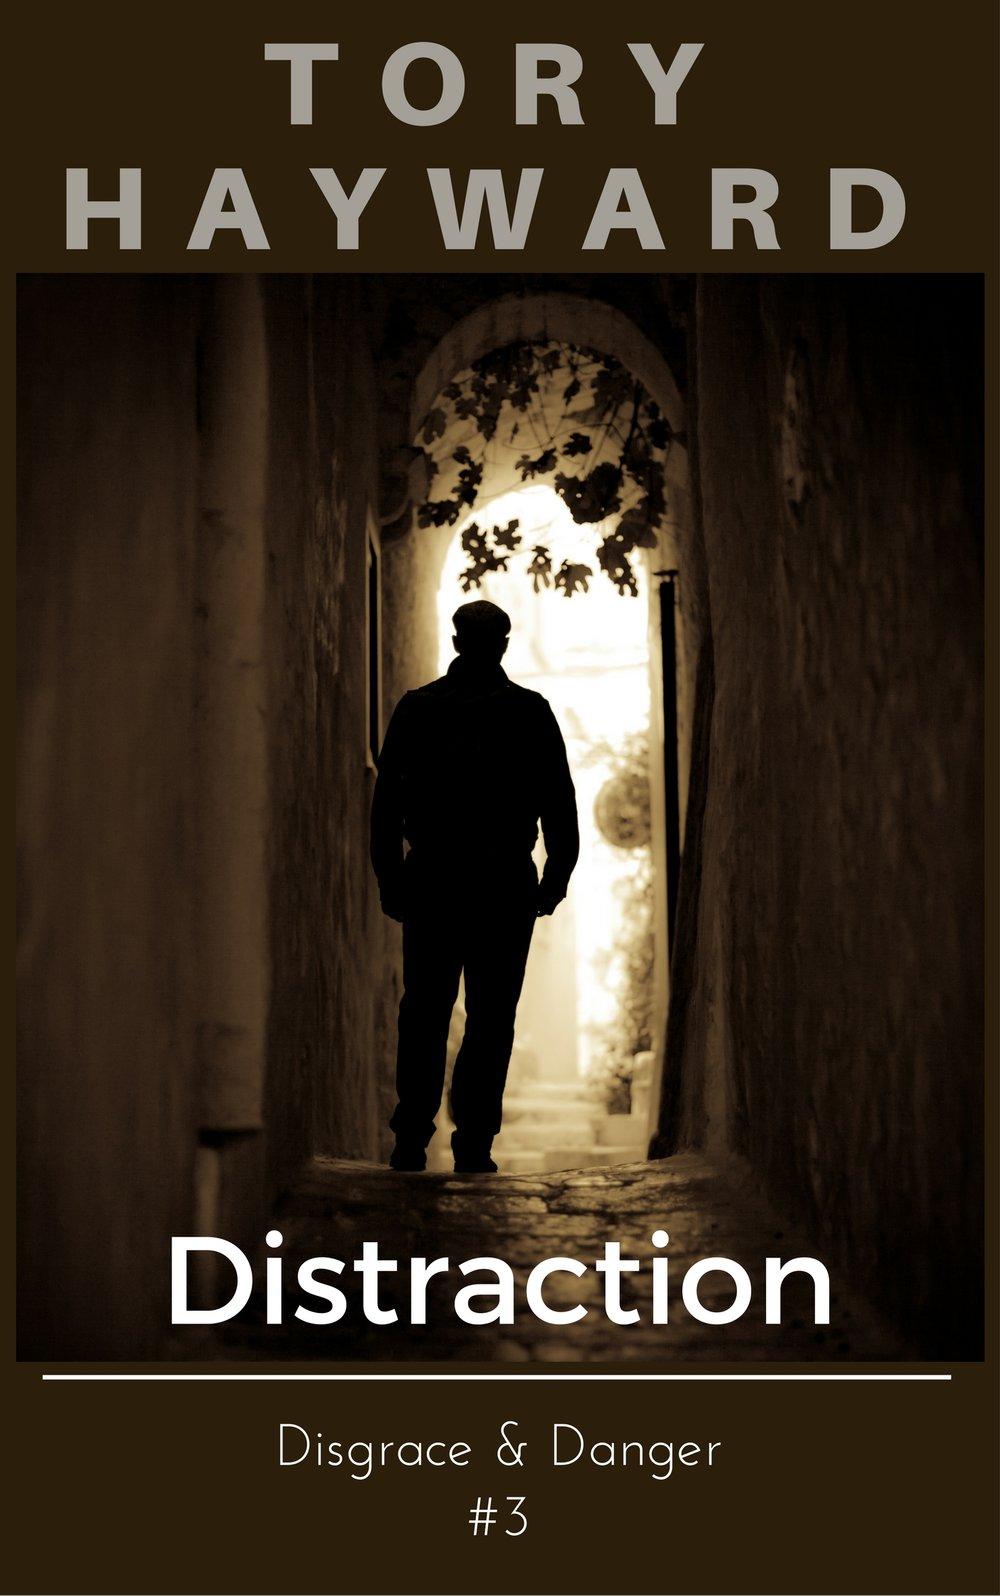 Disgrace & Danger #3: Distraction